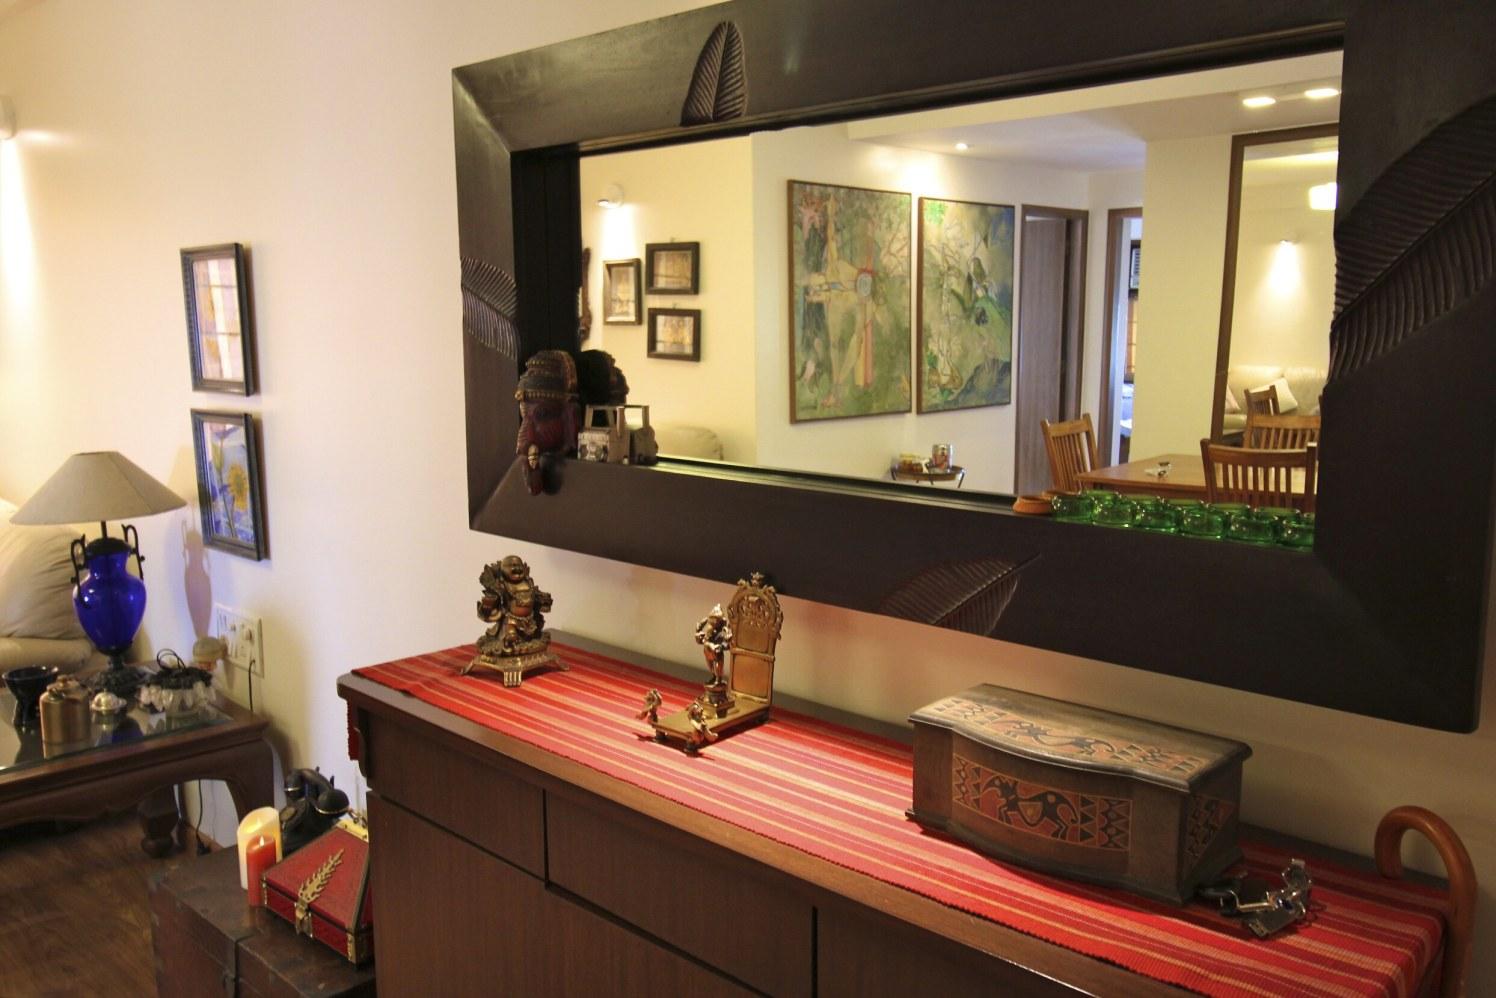 Walnut Brown Wooden Display Unit With Wood Designed Mirror by Viraf Laskari  Living-room Contemporary   Interior Design Photos & Ideas